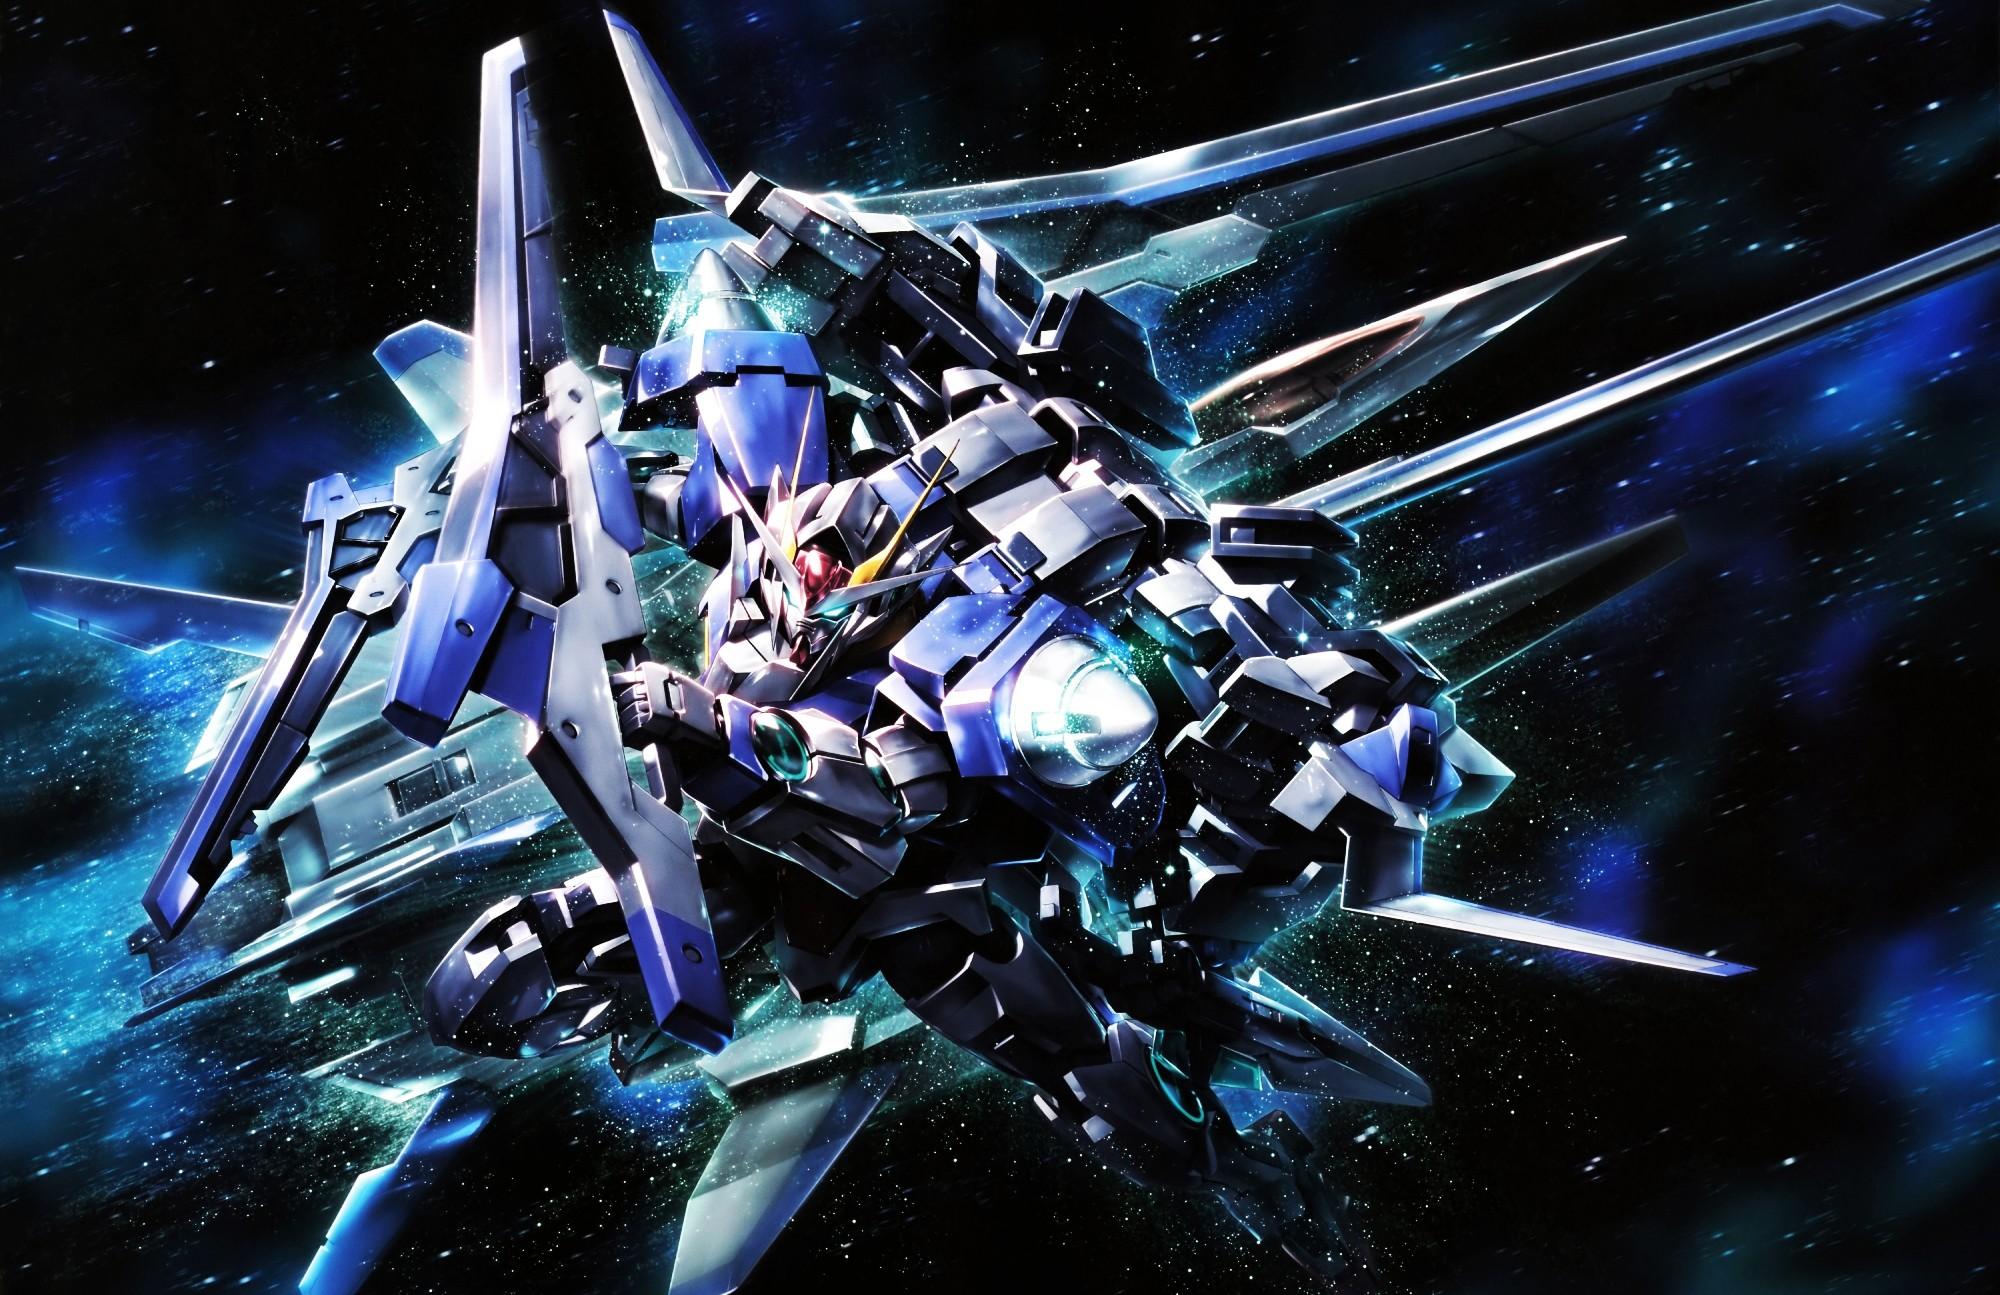 Gundam Wallpaper 2000x1295 Gundam 2000x1295